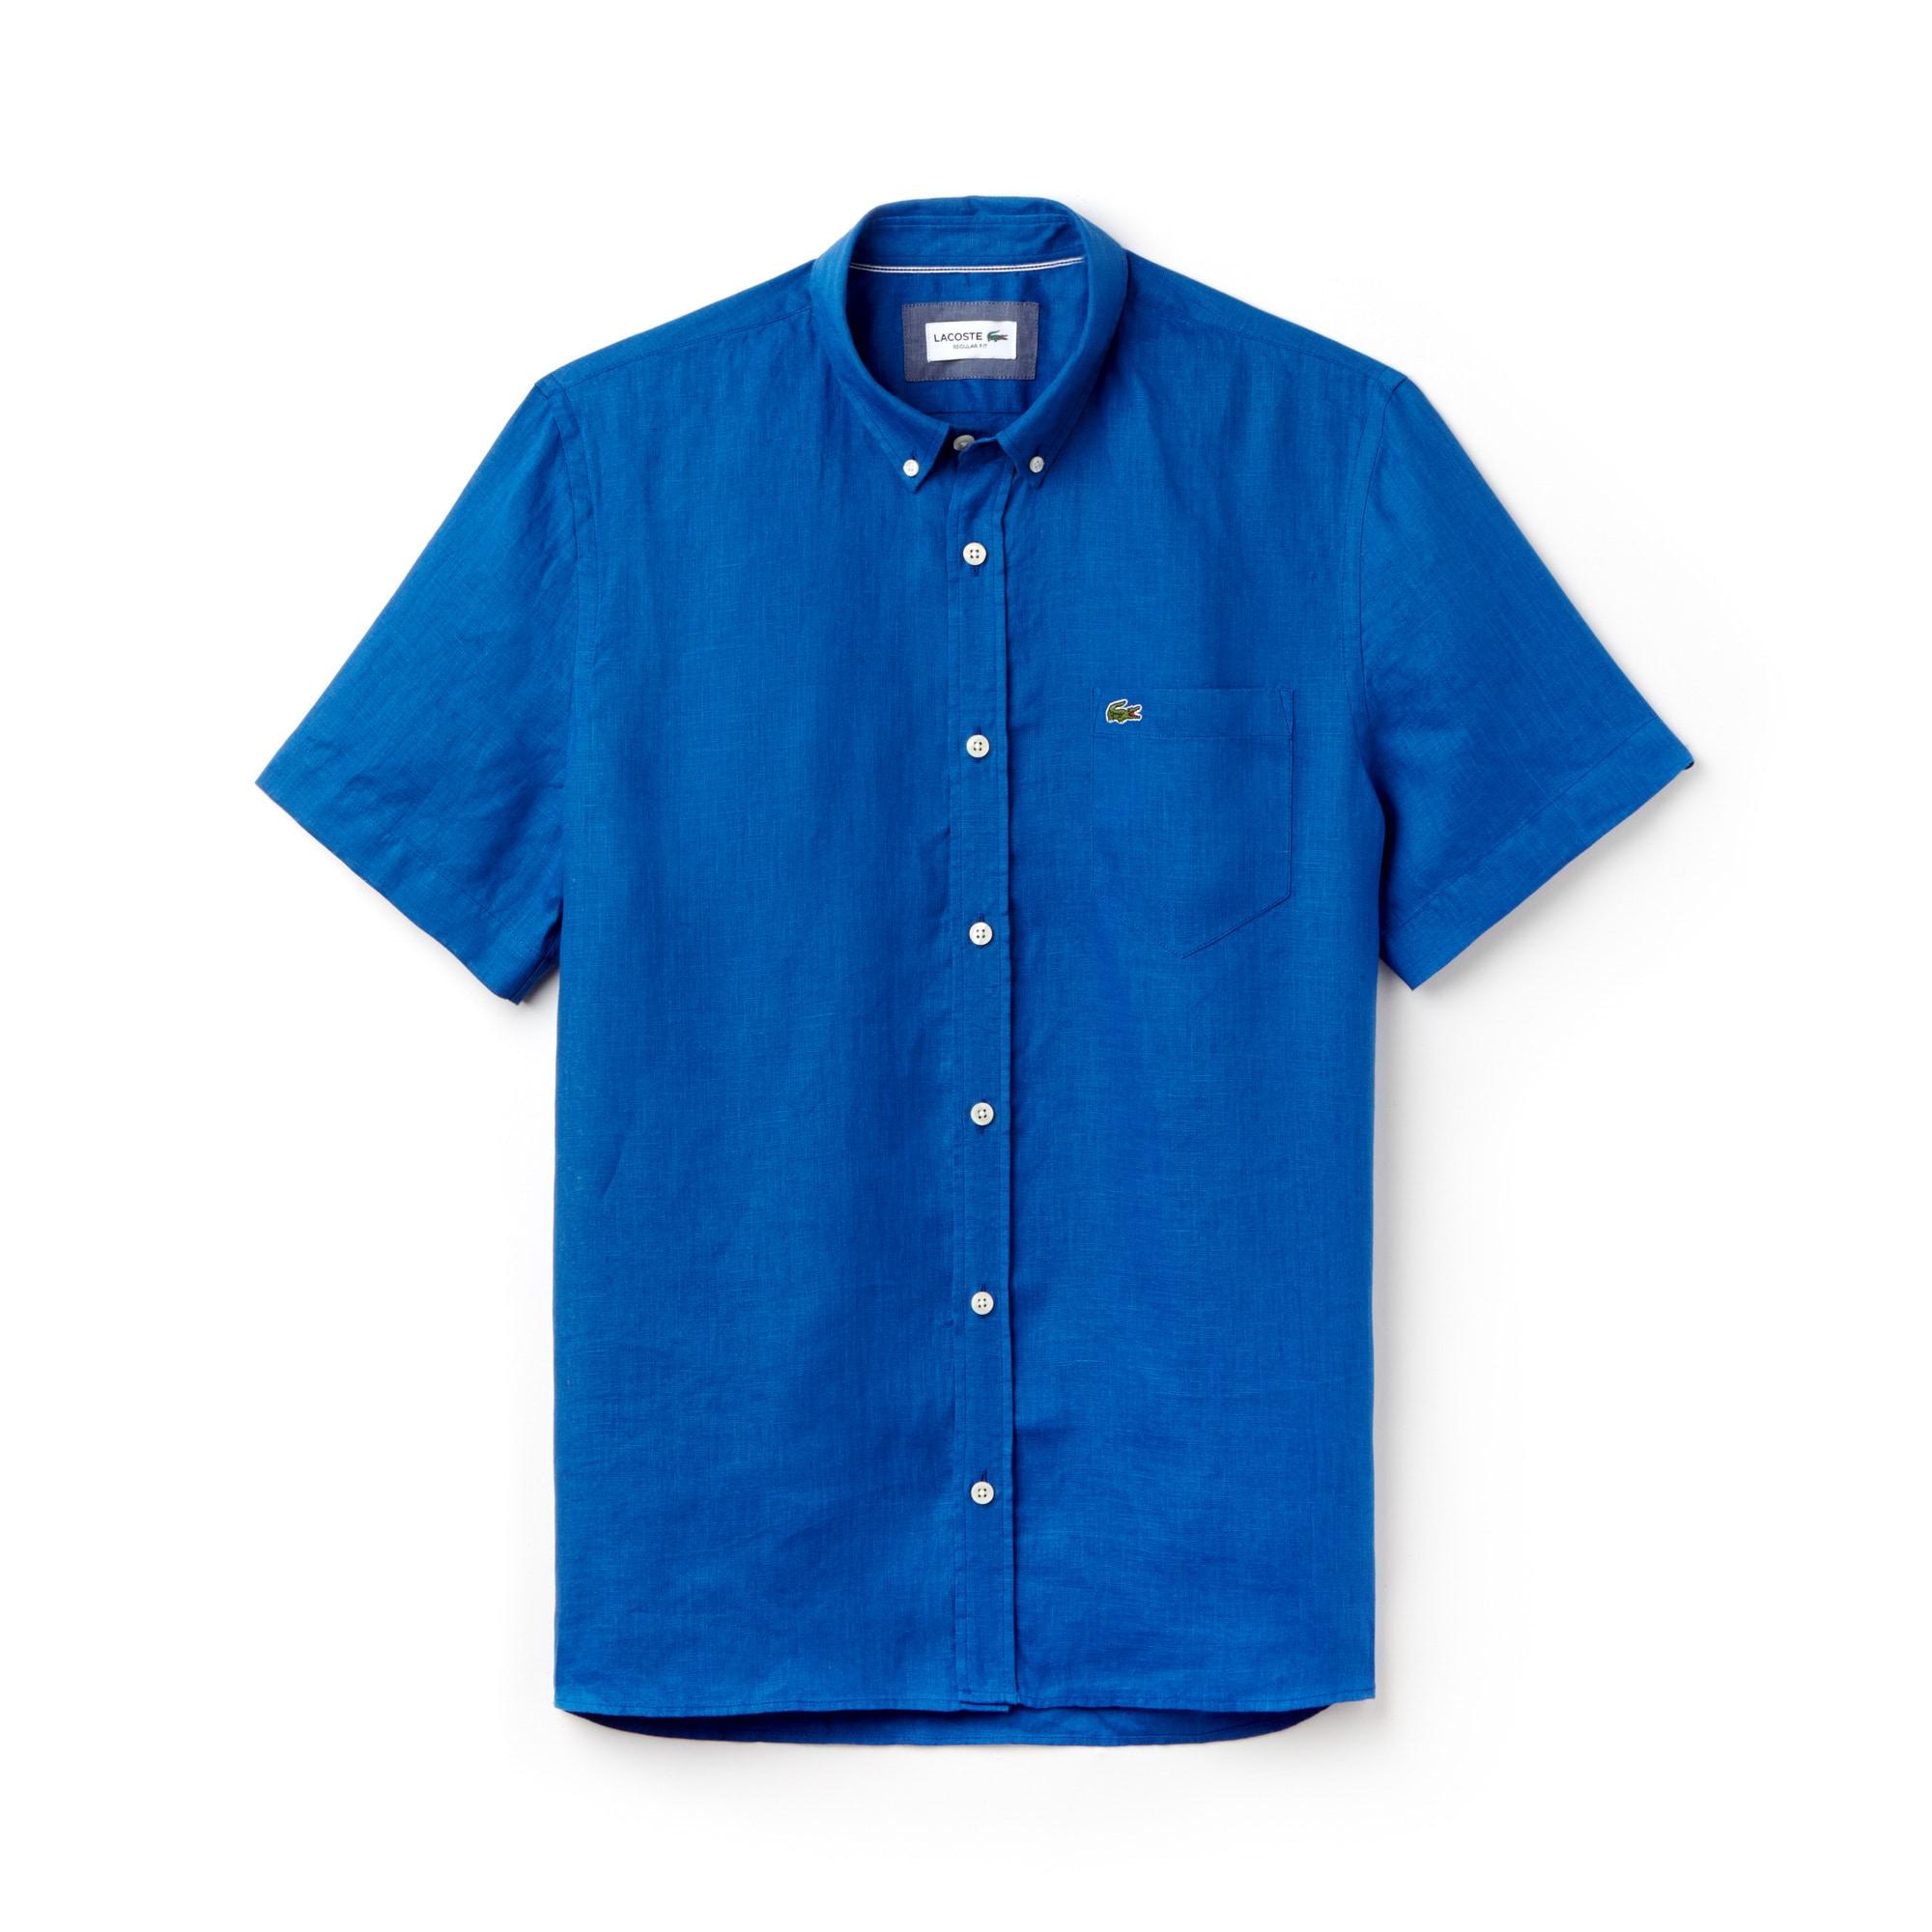 Camicia regular fit a maniche corte in tela di lino tinta unita